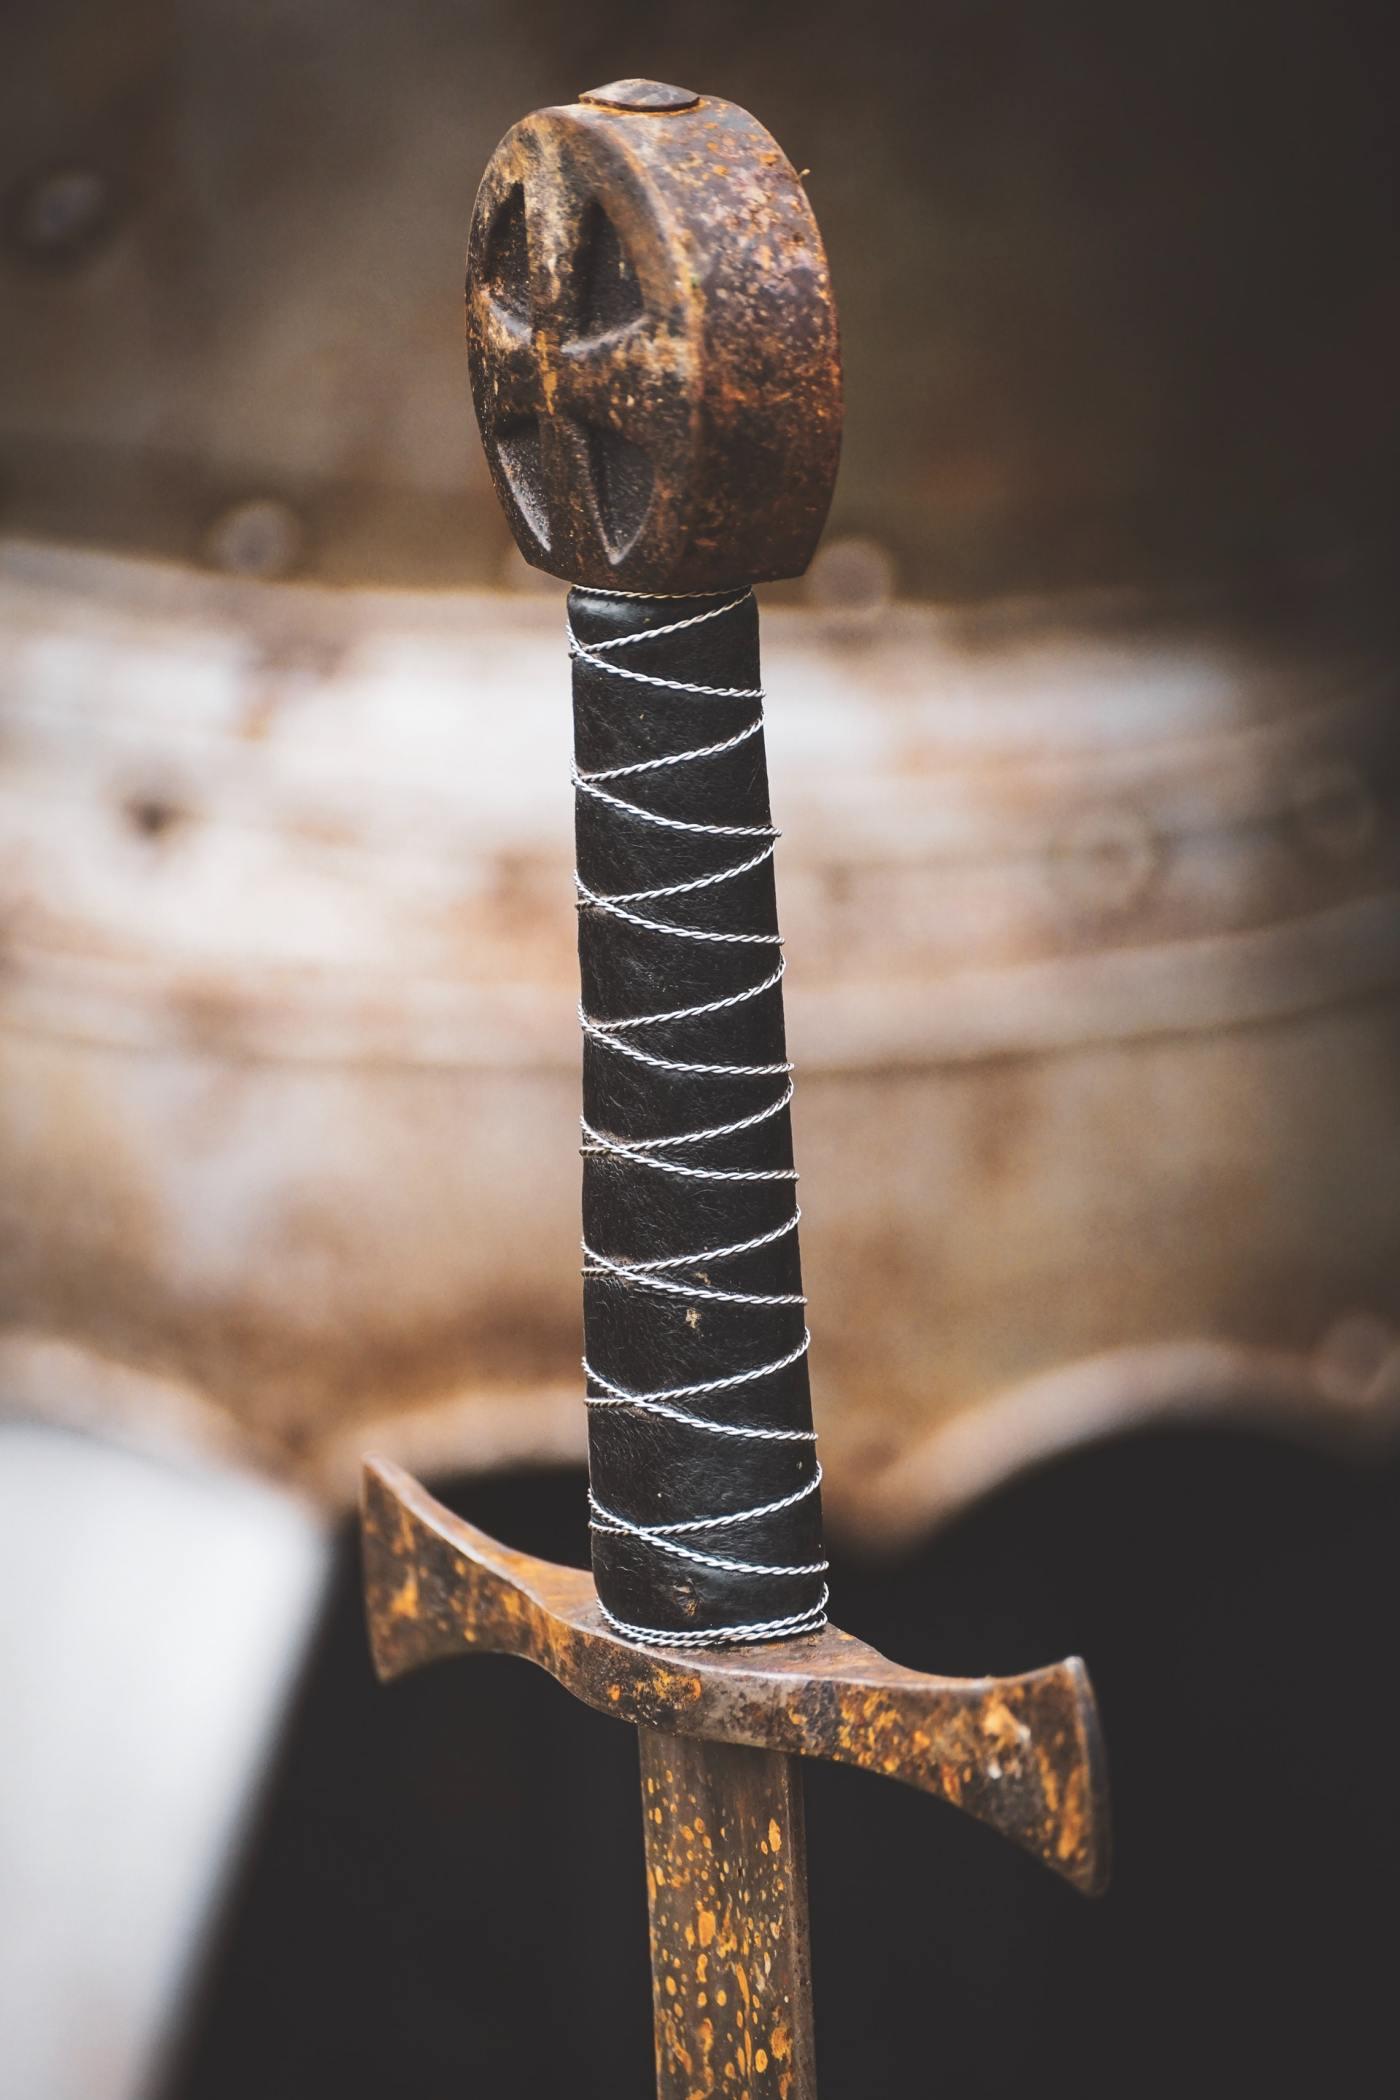 Sword Hilt by Susanne Jutzeler, from pexels.com.